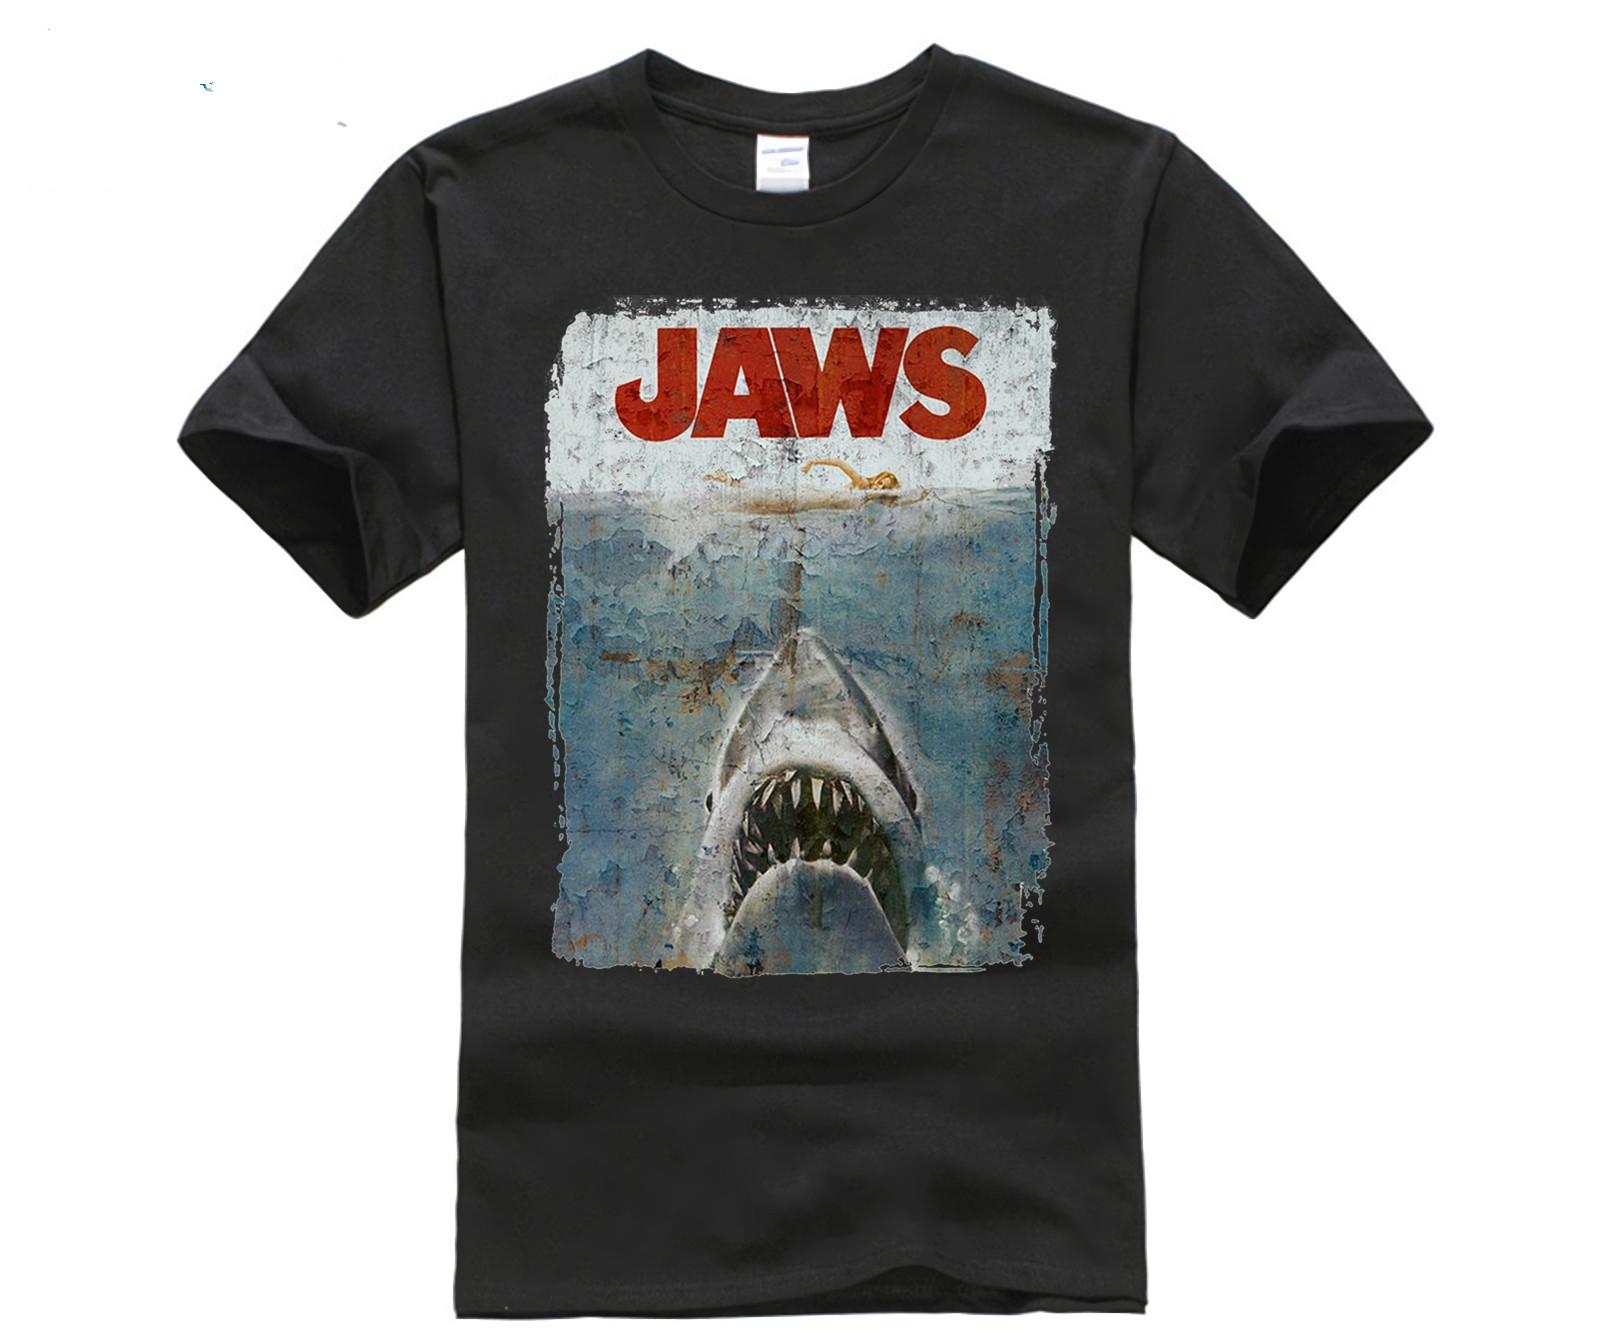 funny men cotton t shirt Men sporter t shirts JAWS DISTRESSED SPIELBERG RETRO MOVIE POSTER sporter t shirts